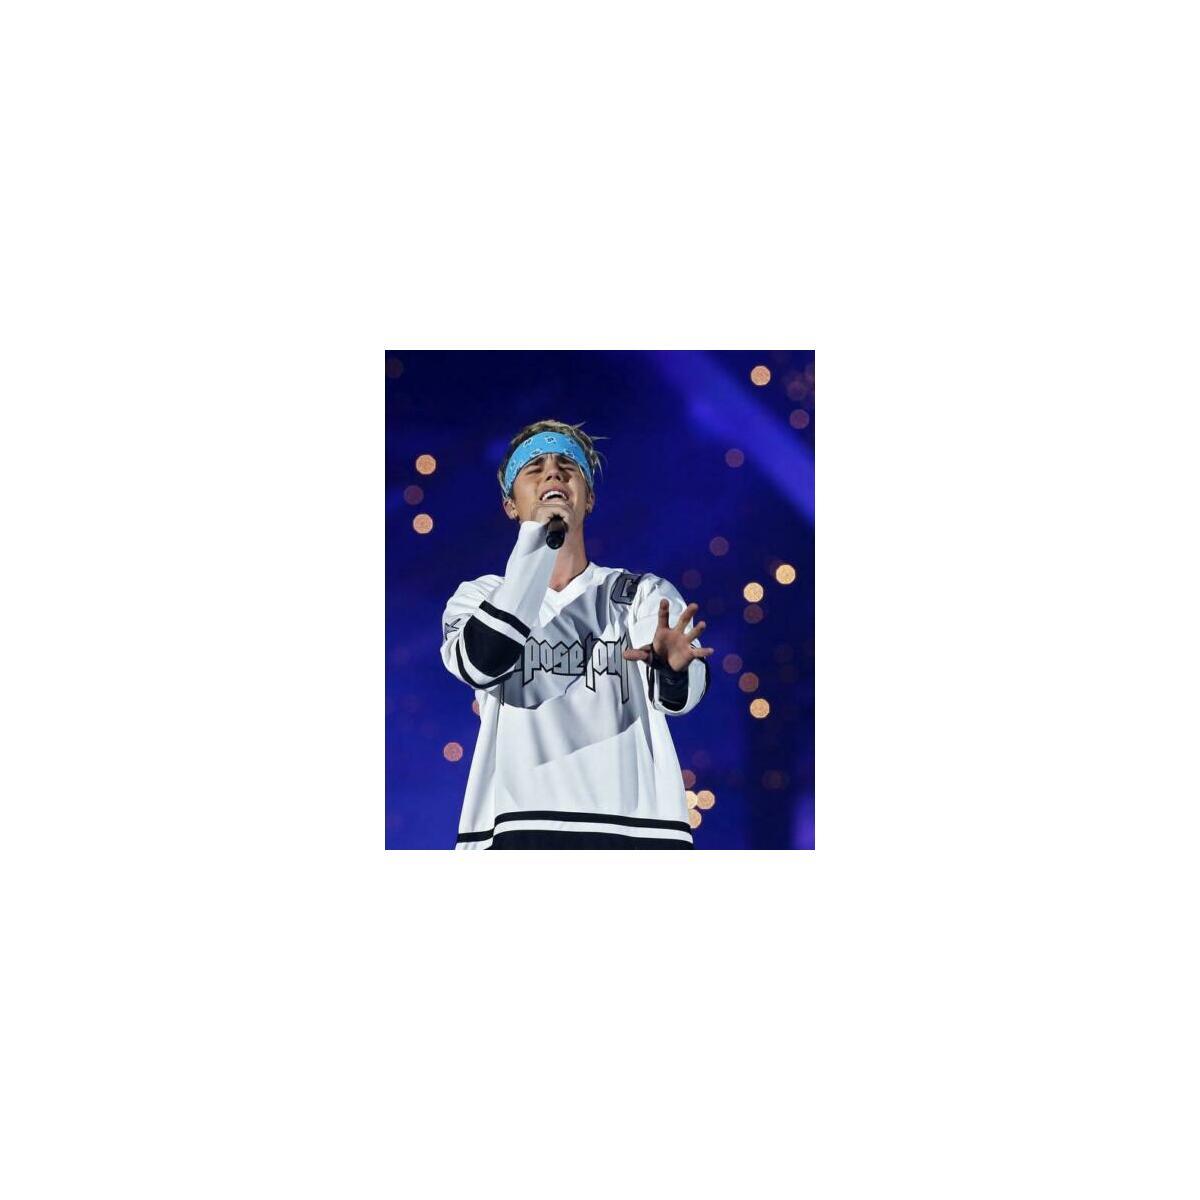 Justin Bieber Purpose Tour Number 6 Jersey